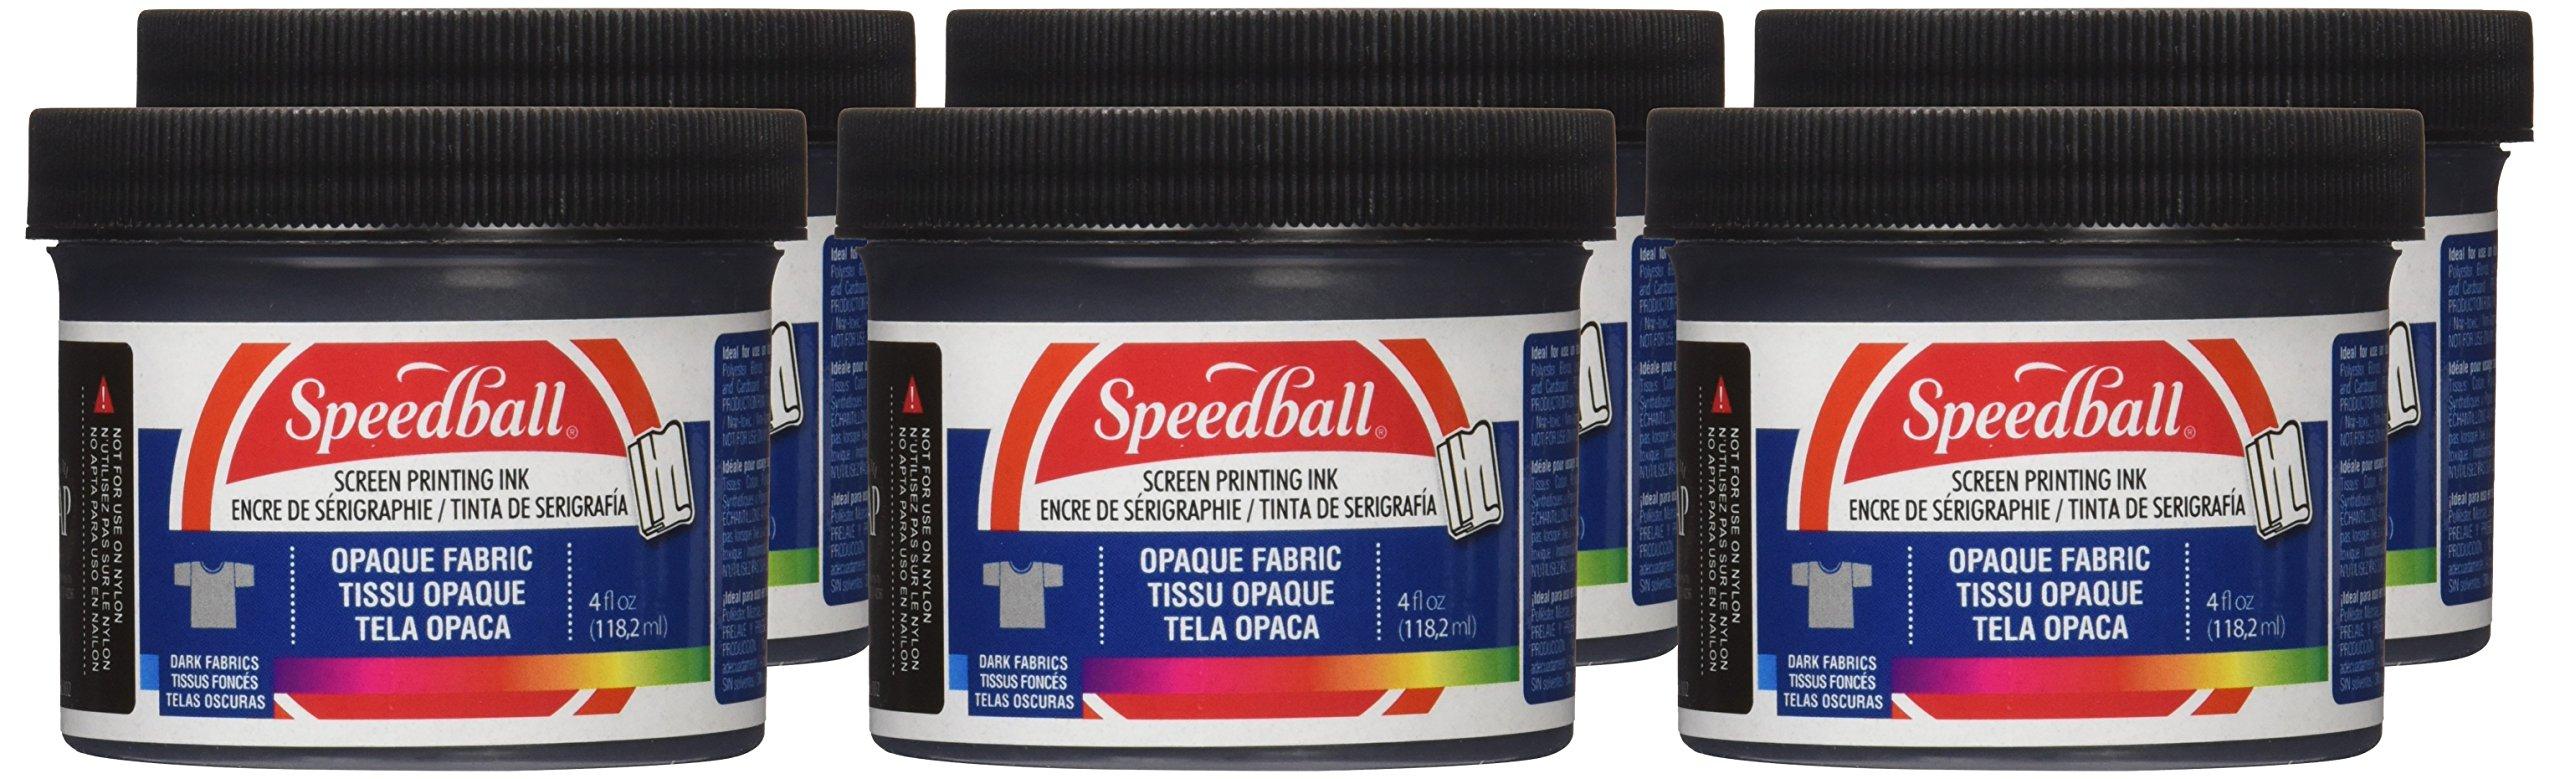 Speedball Opaque Fabric Screen Printing Ink Starter Set